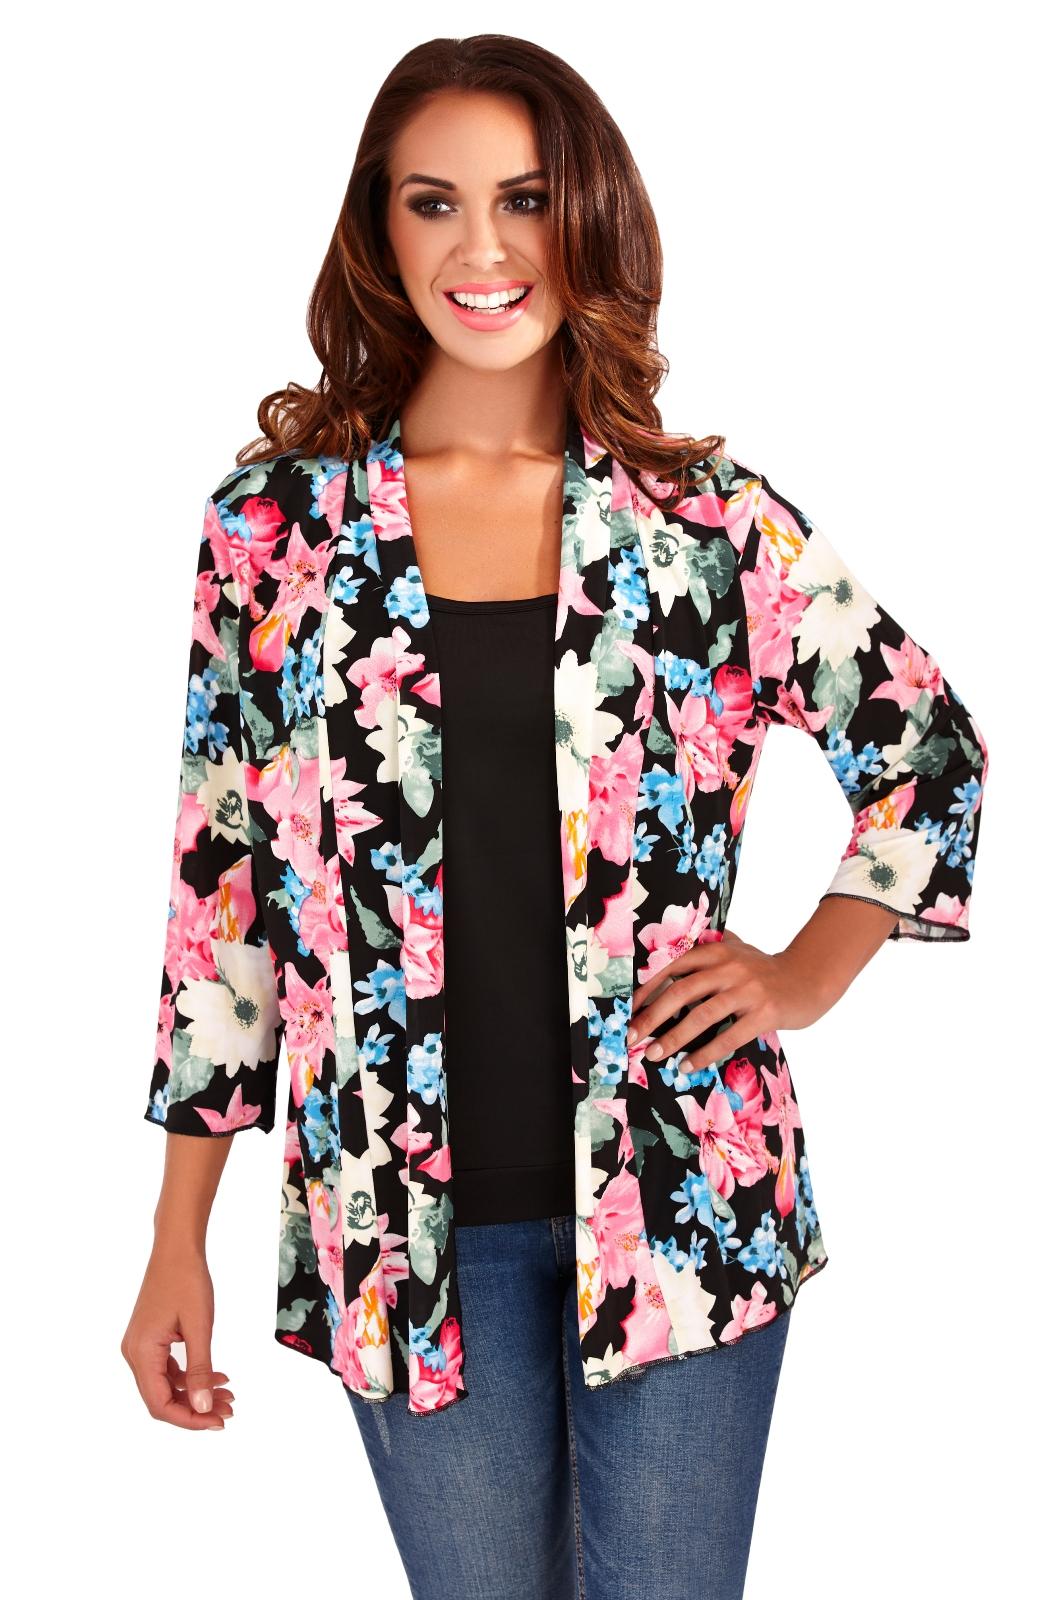 Womens Kimono Boho Cardigan Cape Floral Summer Jacket